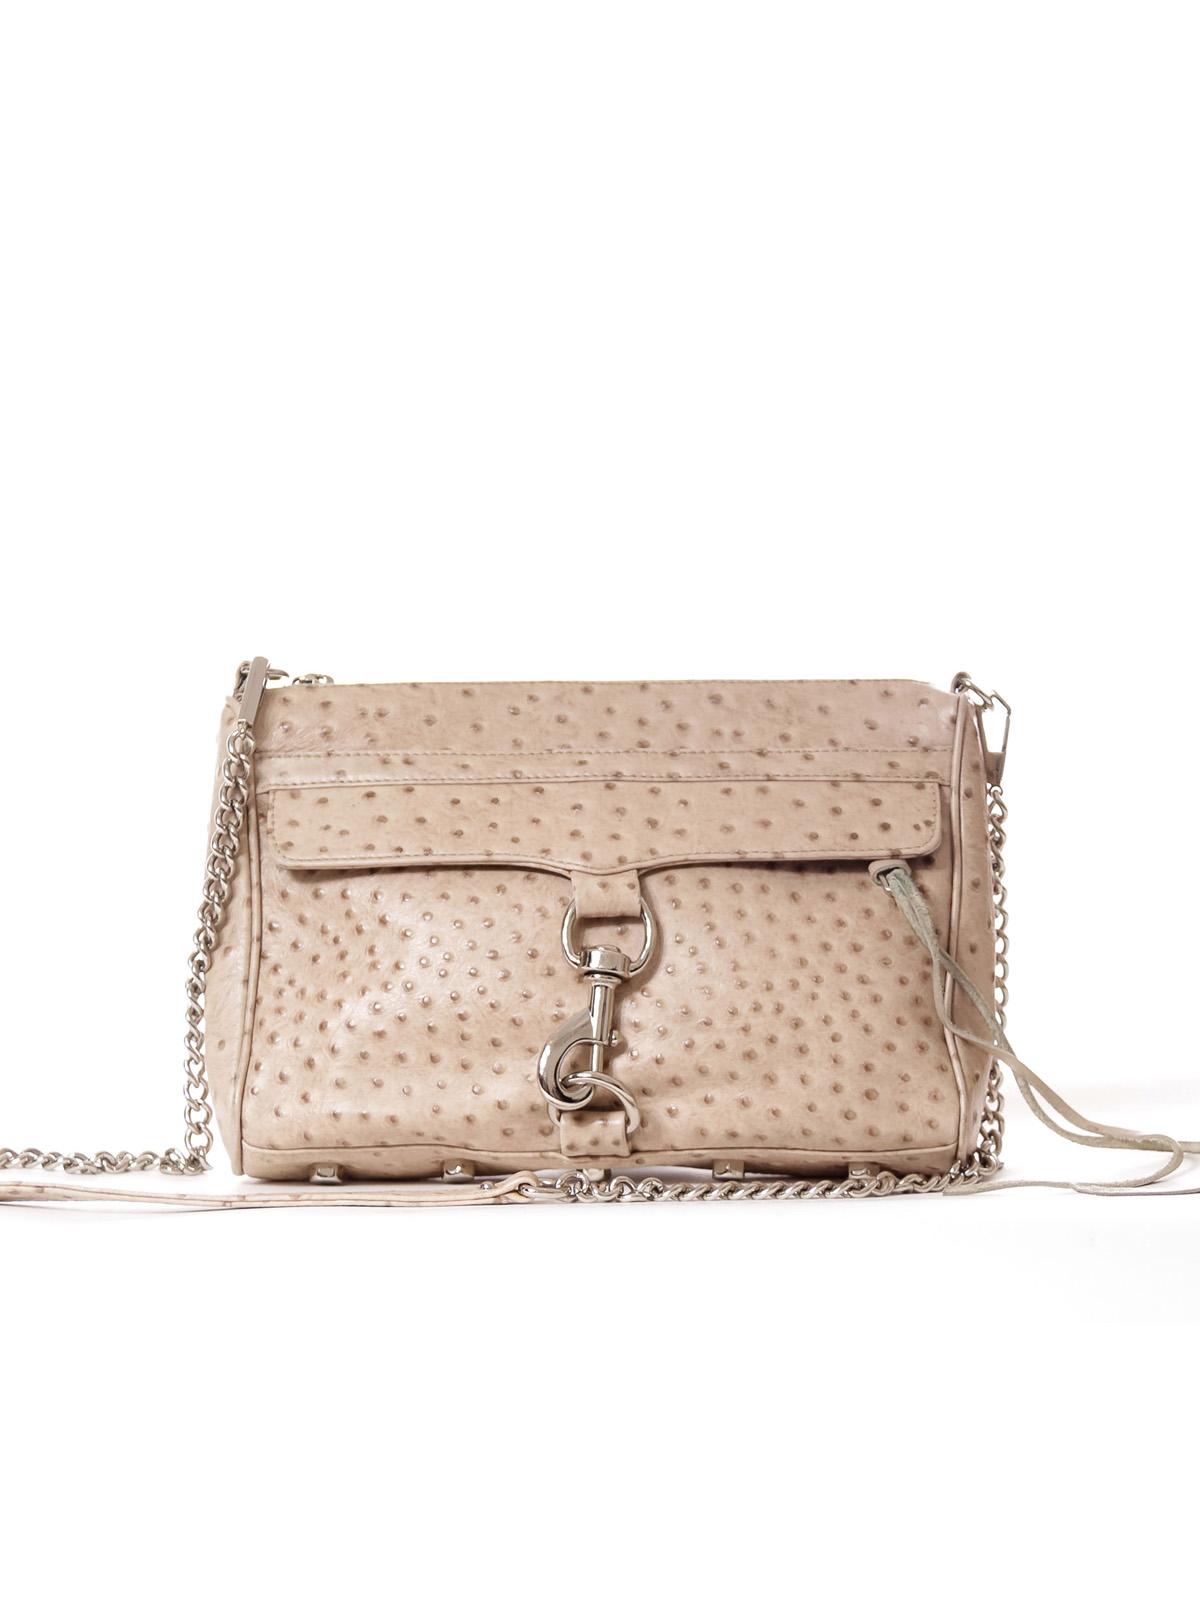 Beige Ostrich Leather Print Crossbody Bag*